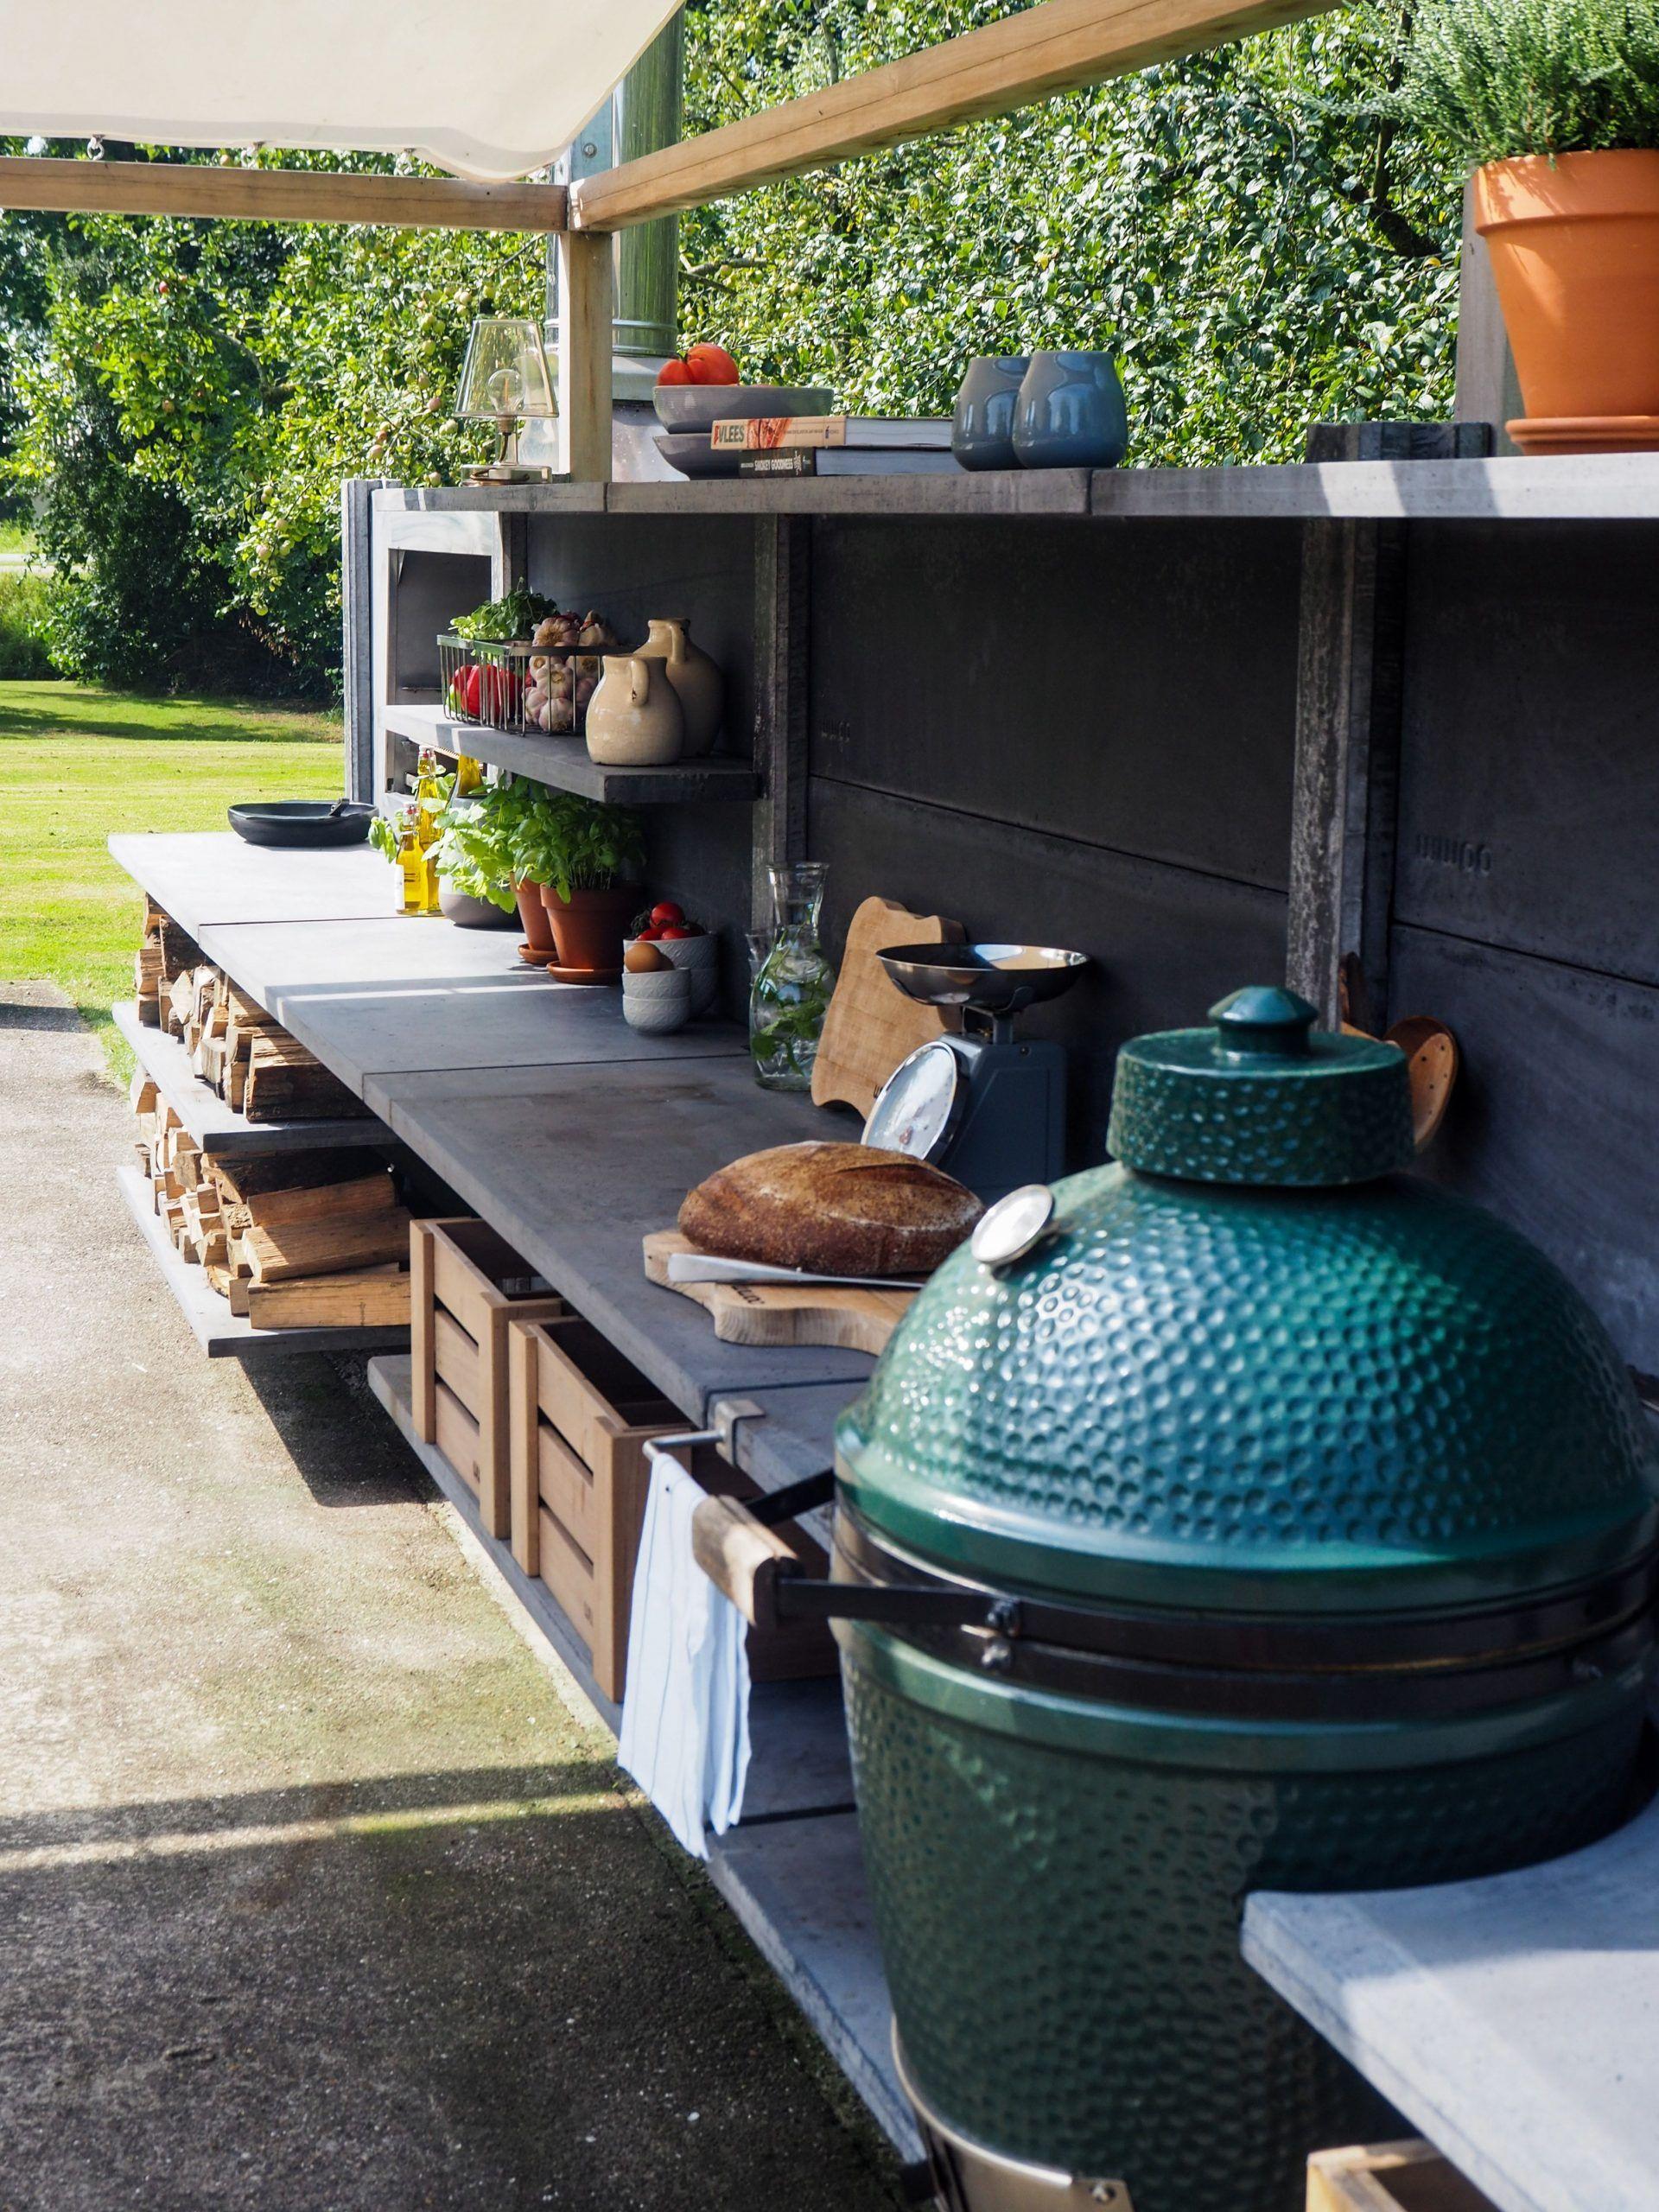 Close-up of the WWOO outdoor kitchen in anthracite | www.wwoo.nl#anthracite #closeup #kitchen #outdoor #wwoo #wwwwwoonl